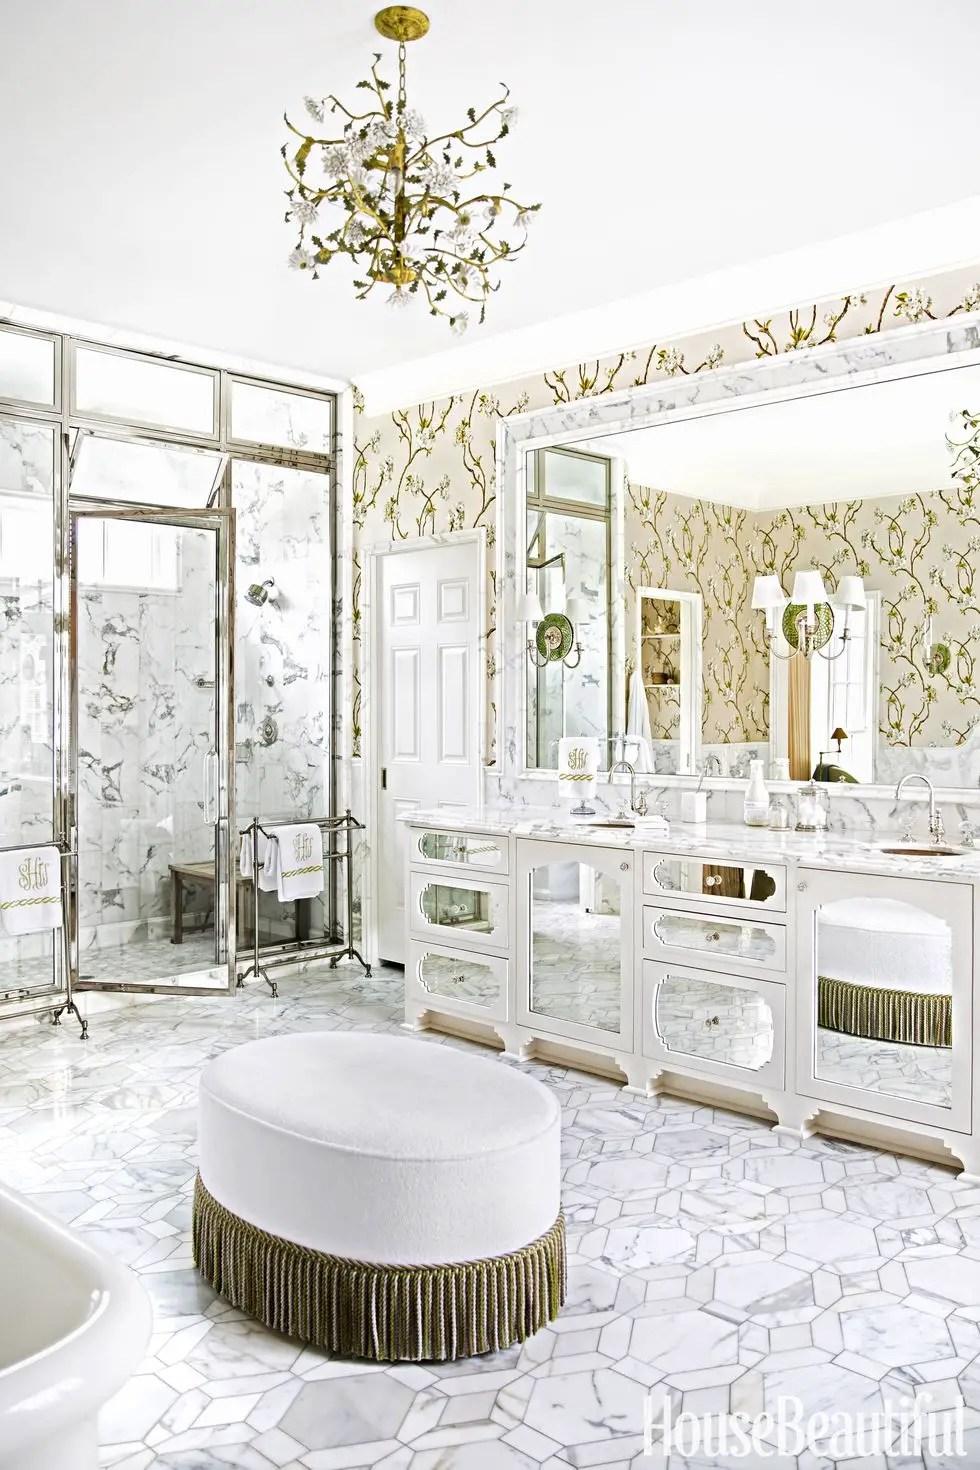 Glitzy bathroom chandelier